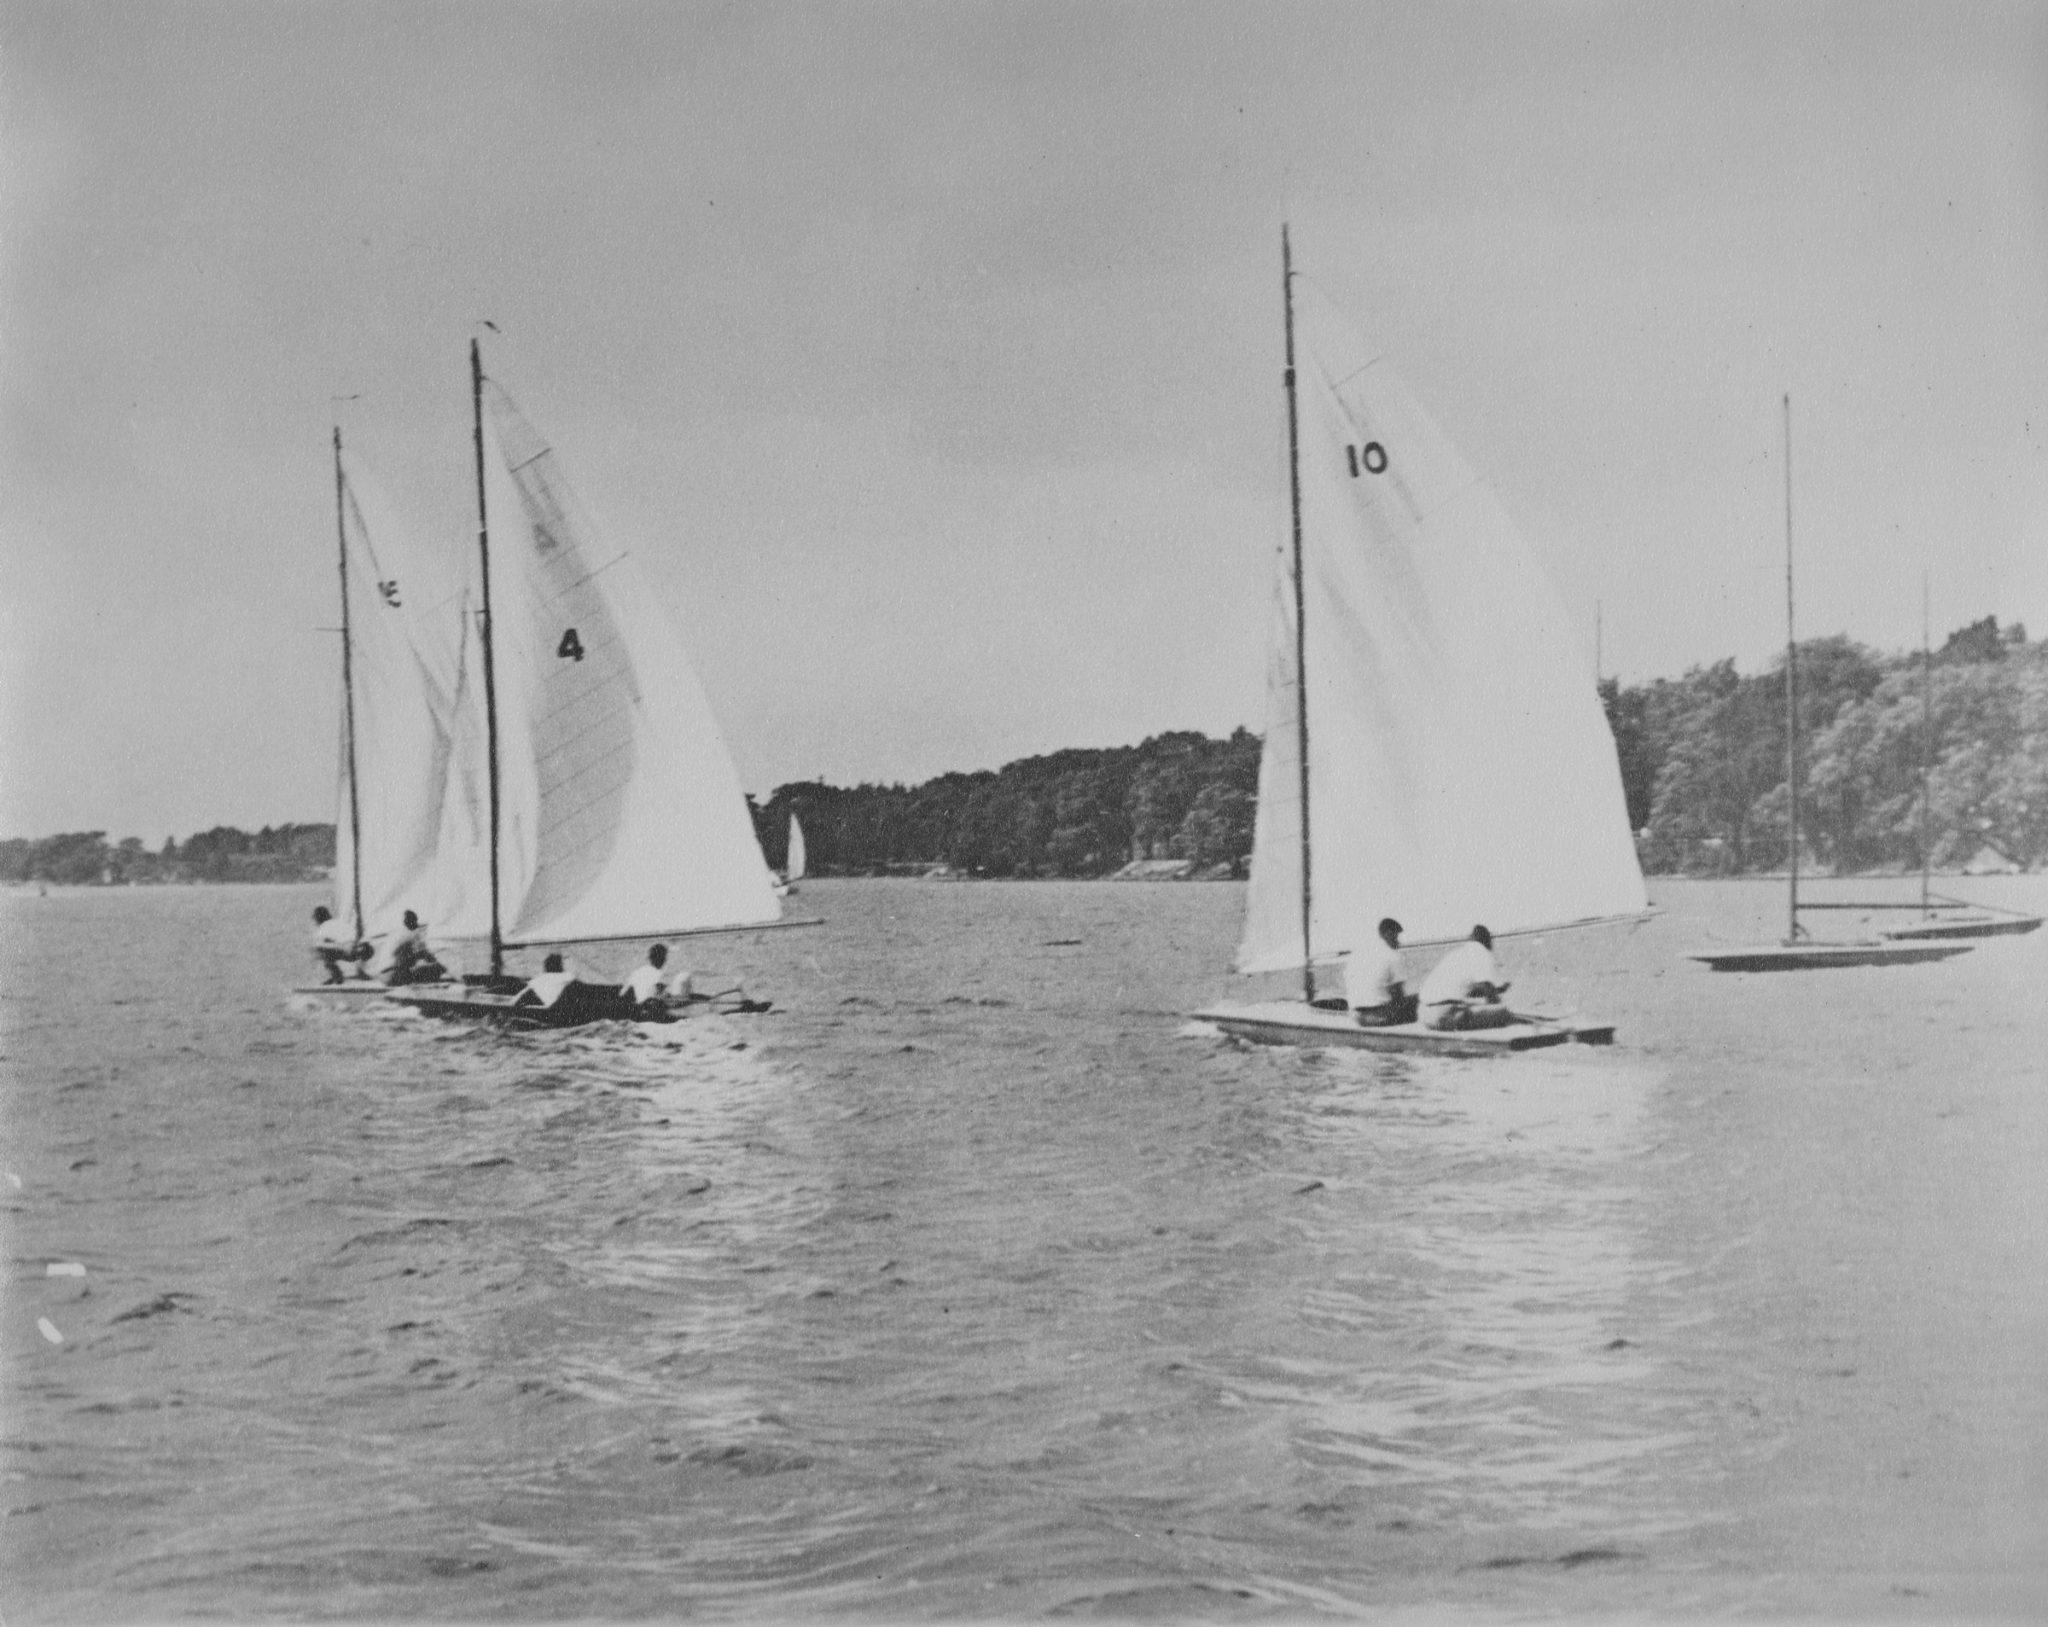 Lake Q - Sailing